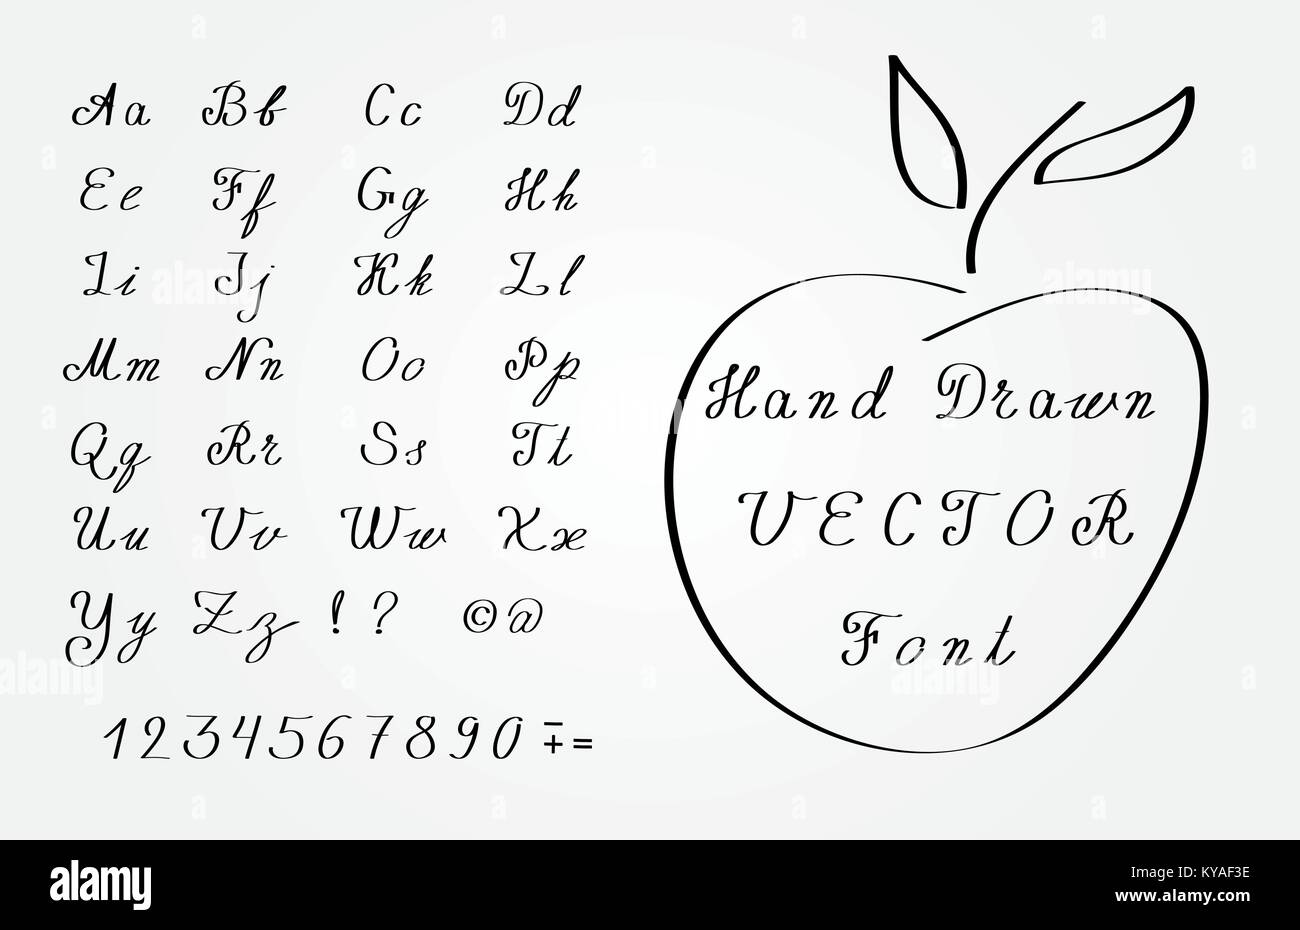 cursive letters stock photos cursive letters stock images alamy. Black Bedroom Furniture Sets. Home Design Ideas